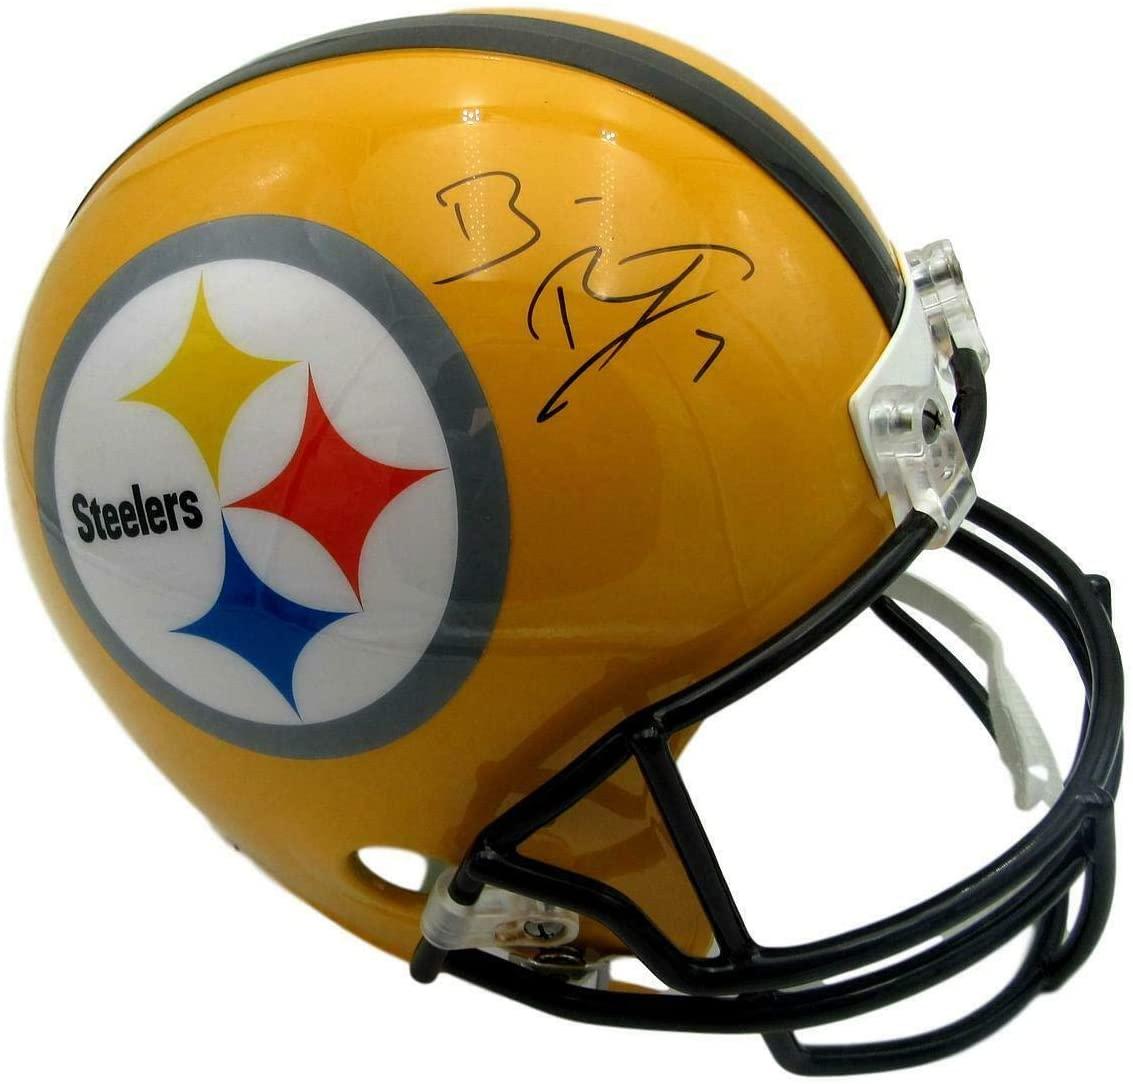 Ben Roethlisberger Signed/Auto Steelers Replica Full Size Helmet Fanatics 153297 - Autographed NFL Helmets